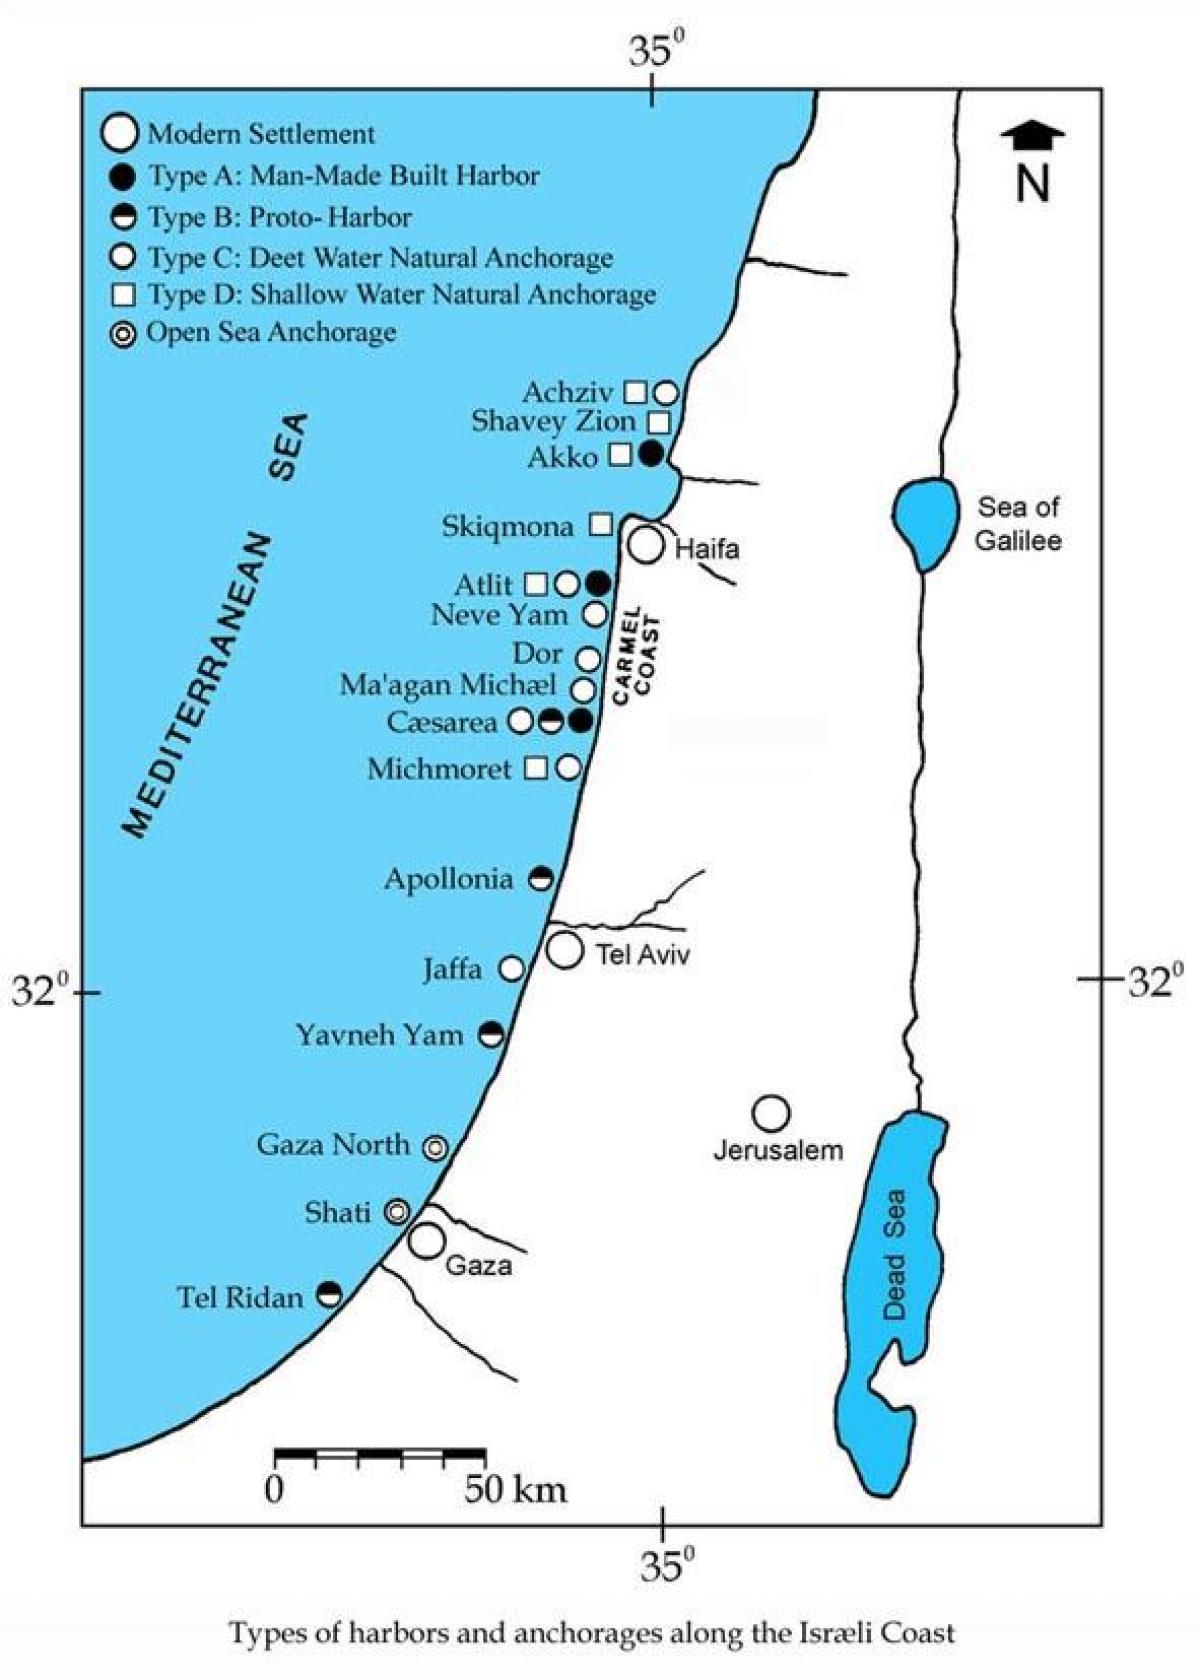 kart over israel Israel porter kart   Kart over israel porter (Vest Asia   Asia) kart over israel